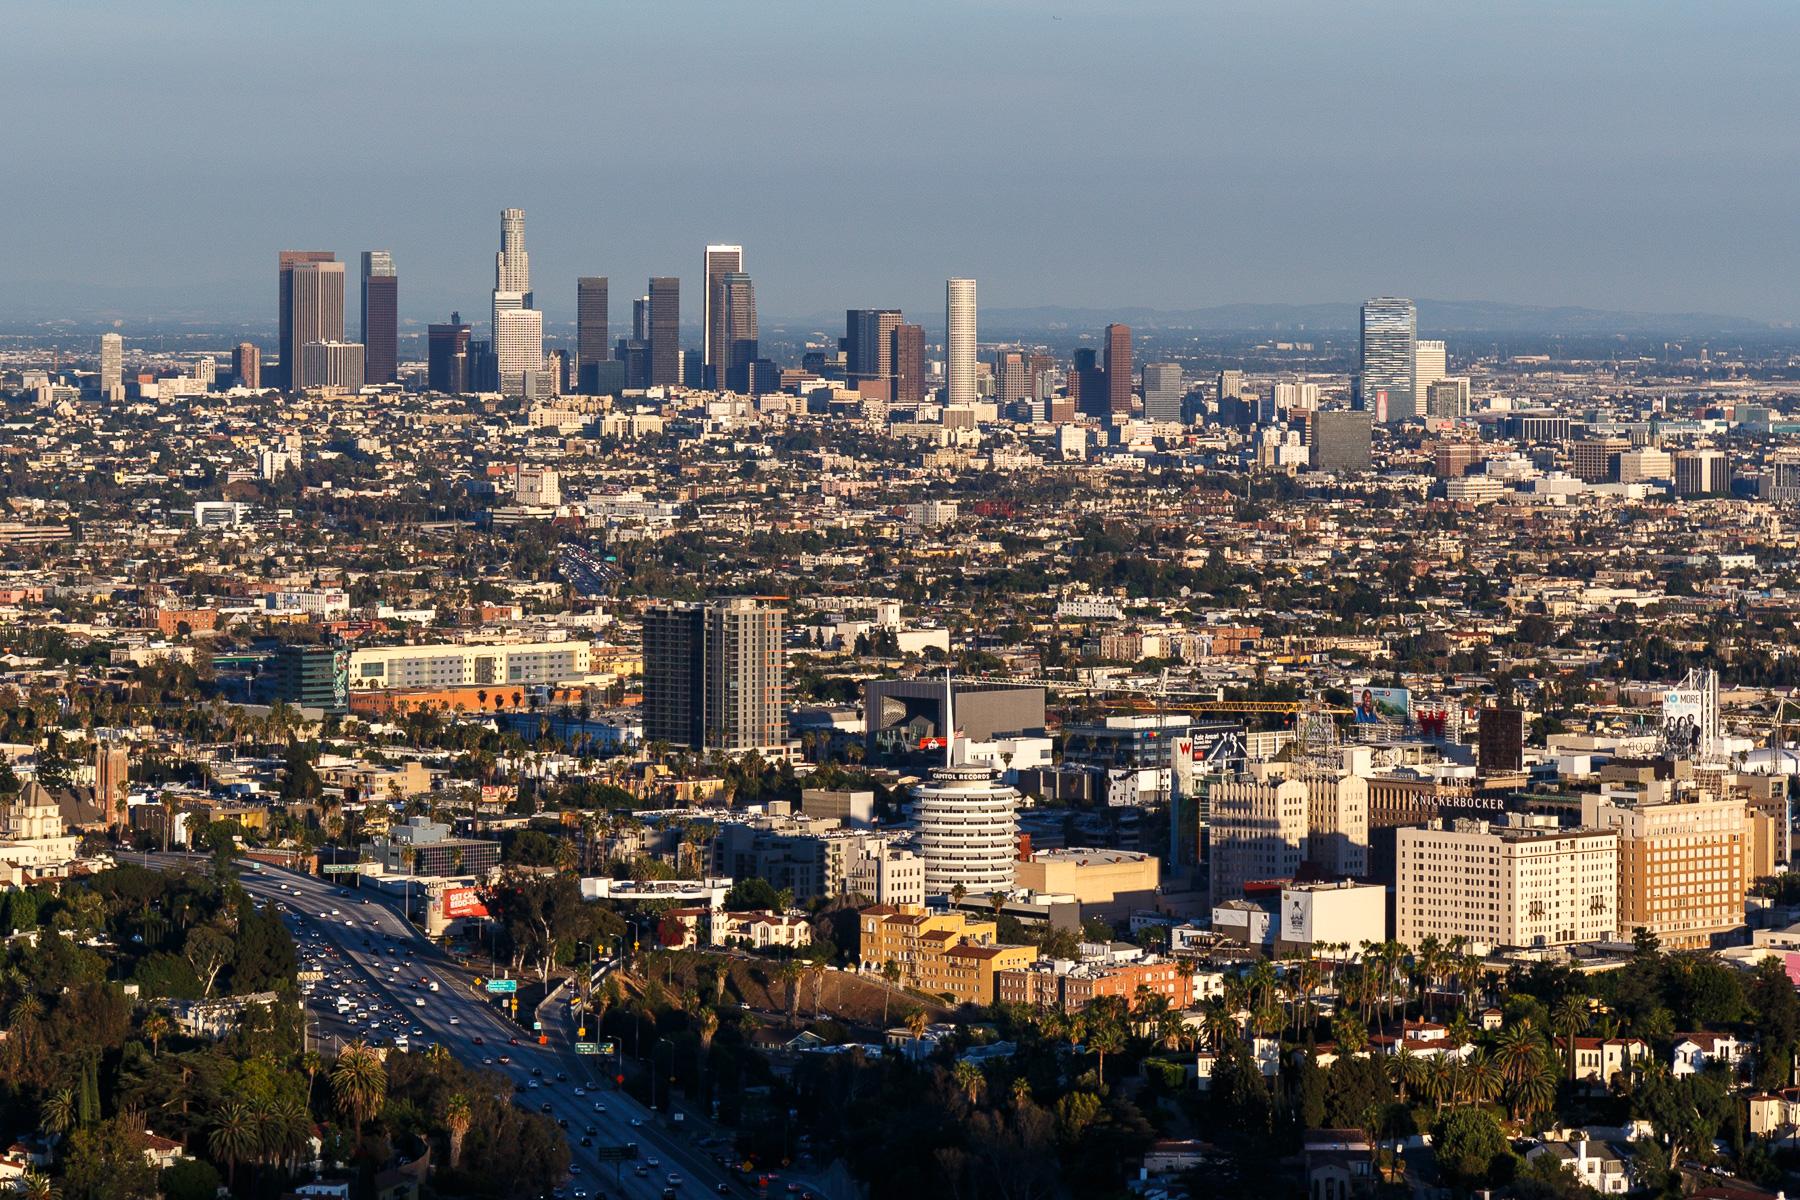 Skyline Los Angeles, USA